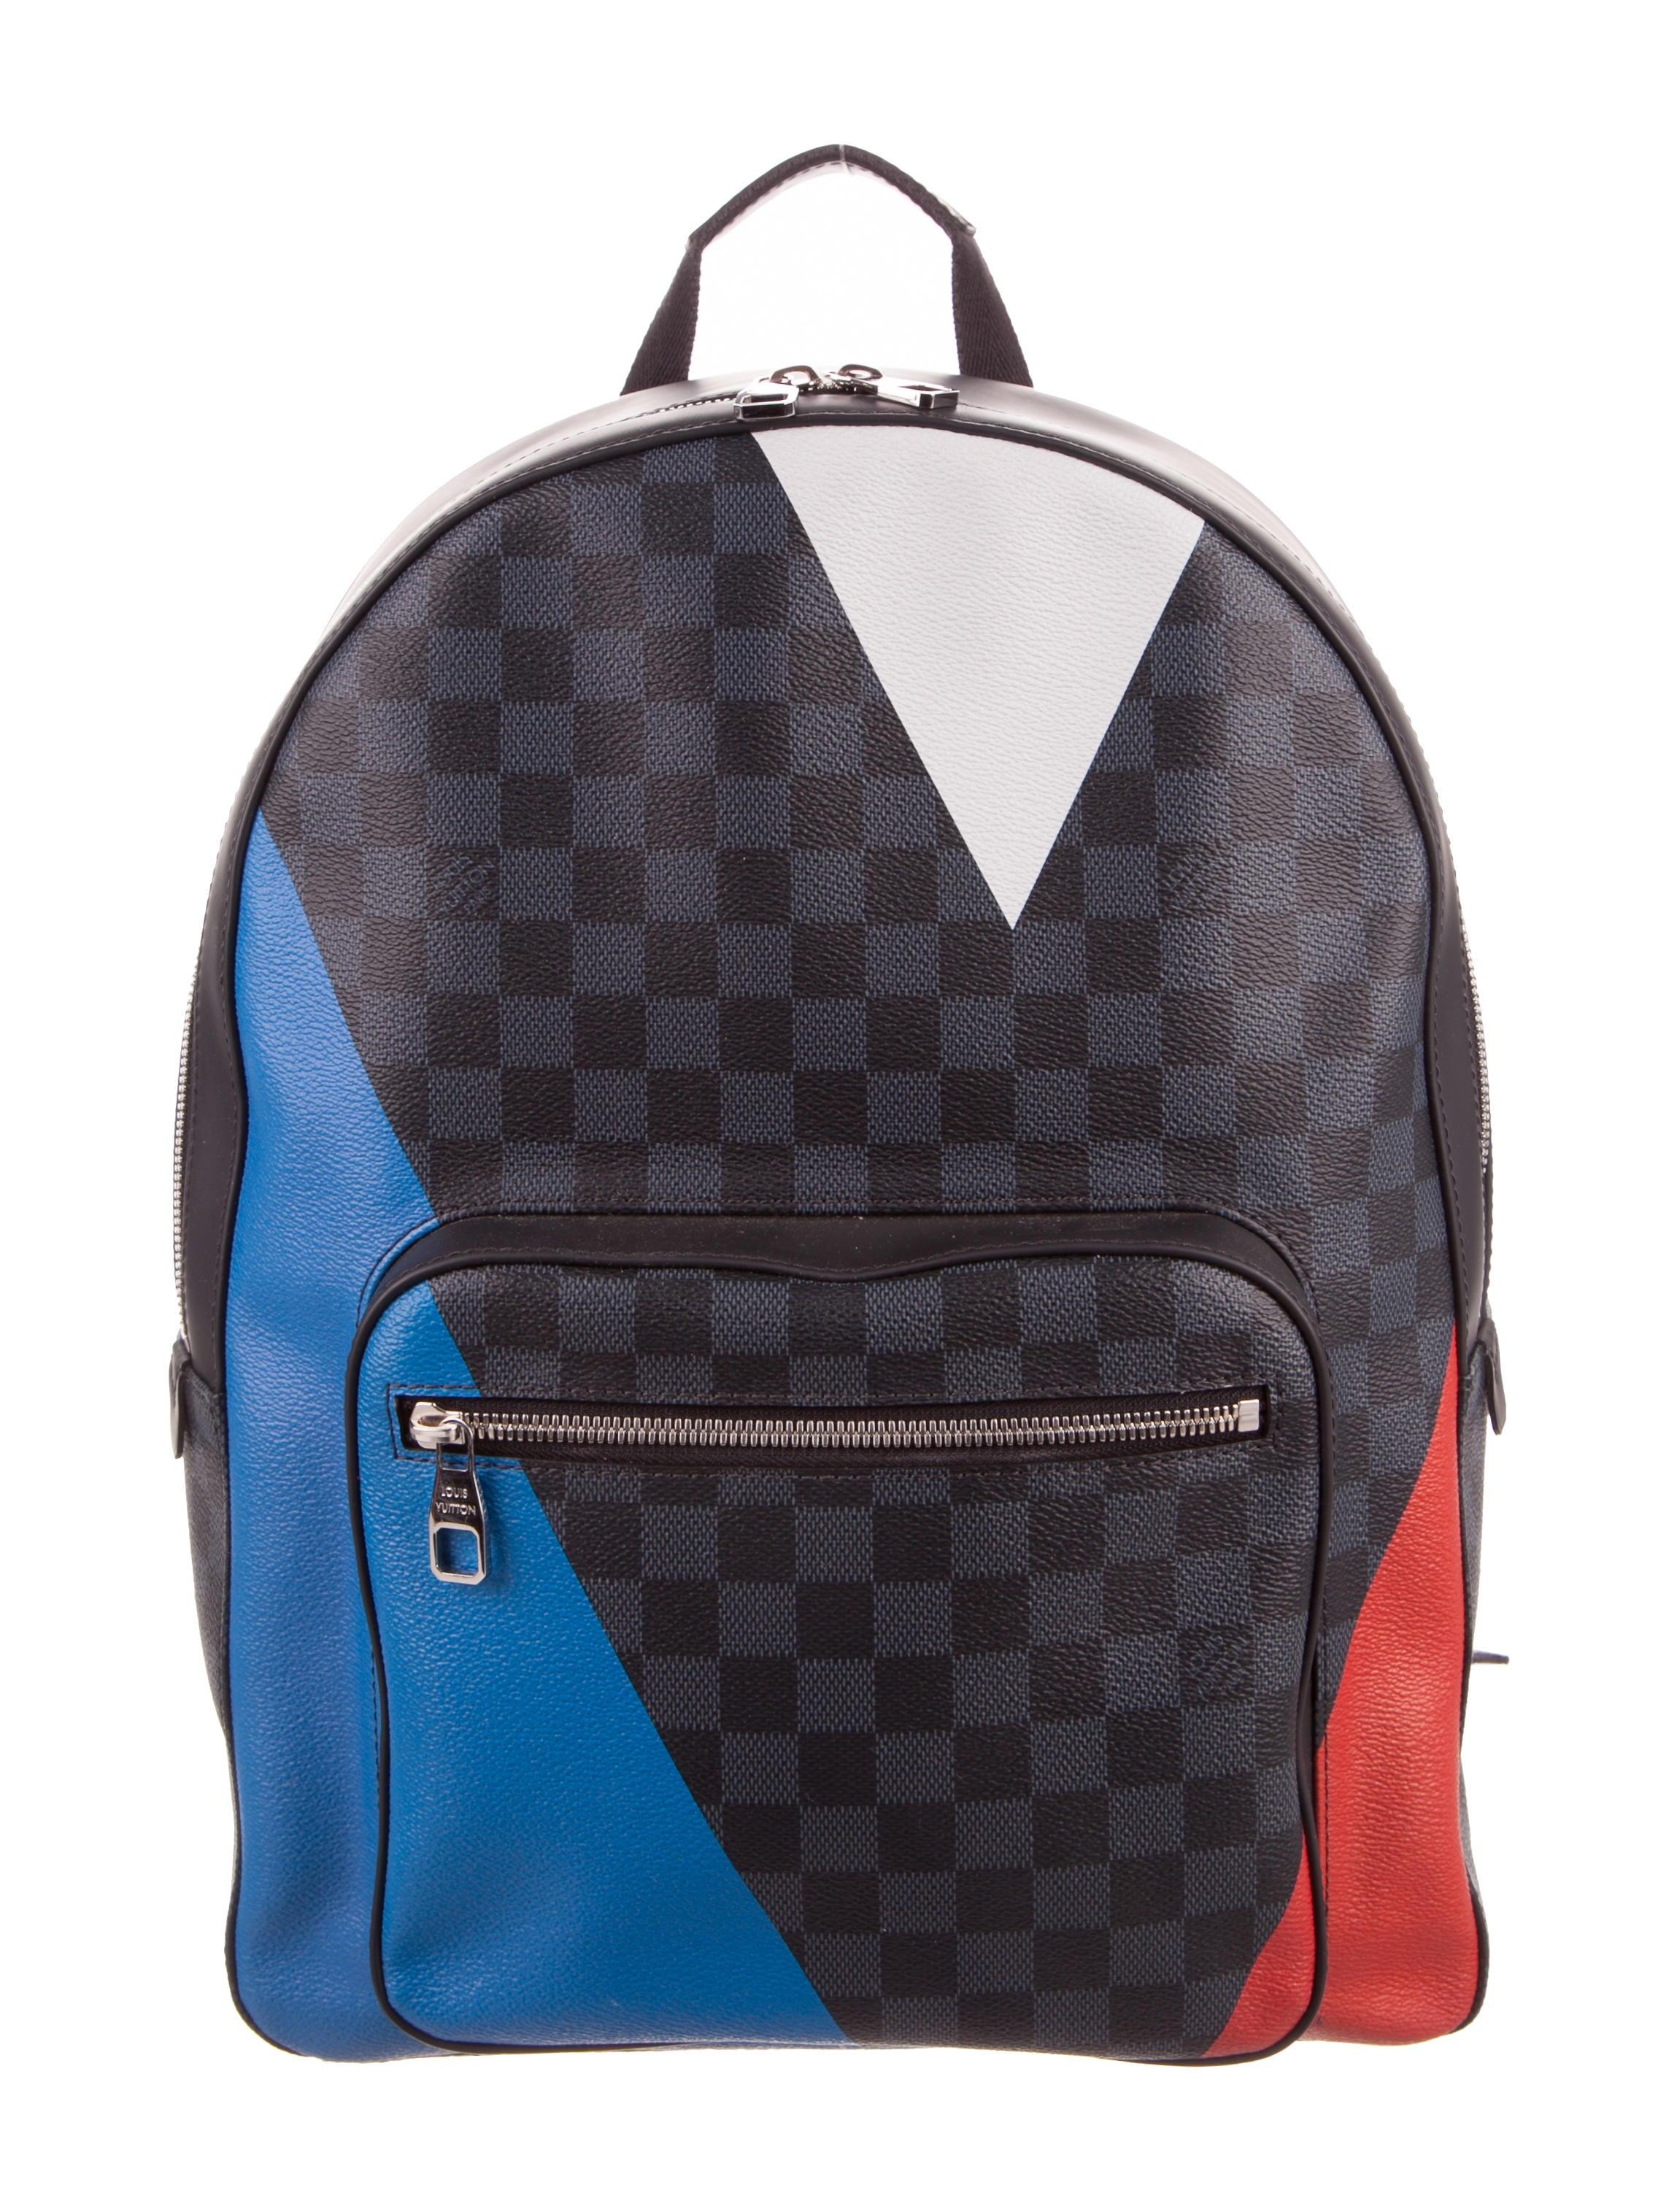 7347cf1c8db9 Louis Vuitton Damier Cobalt Regatta Josh Backpack - Bags - LOU96784 ...